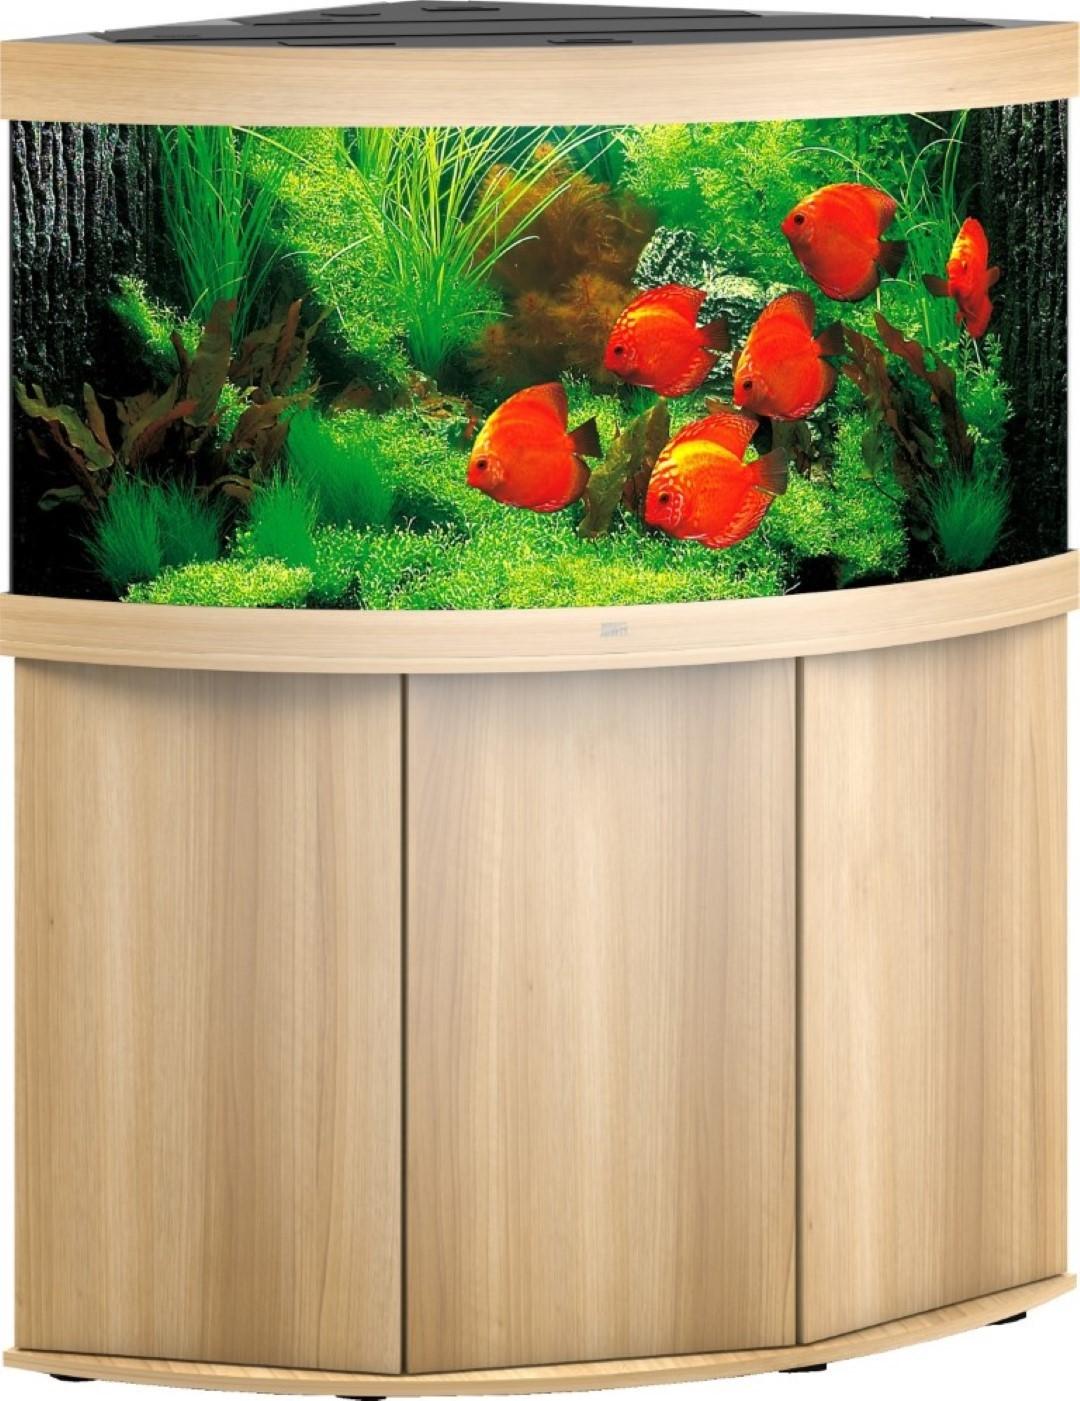 Juwel aquarium Trigon 350 LED met filter licht eiken